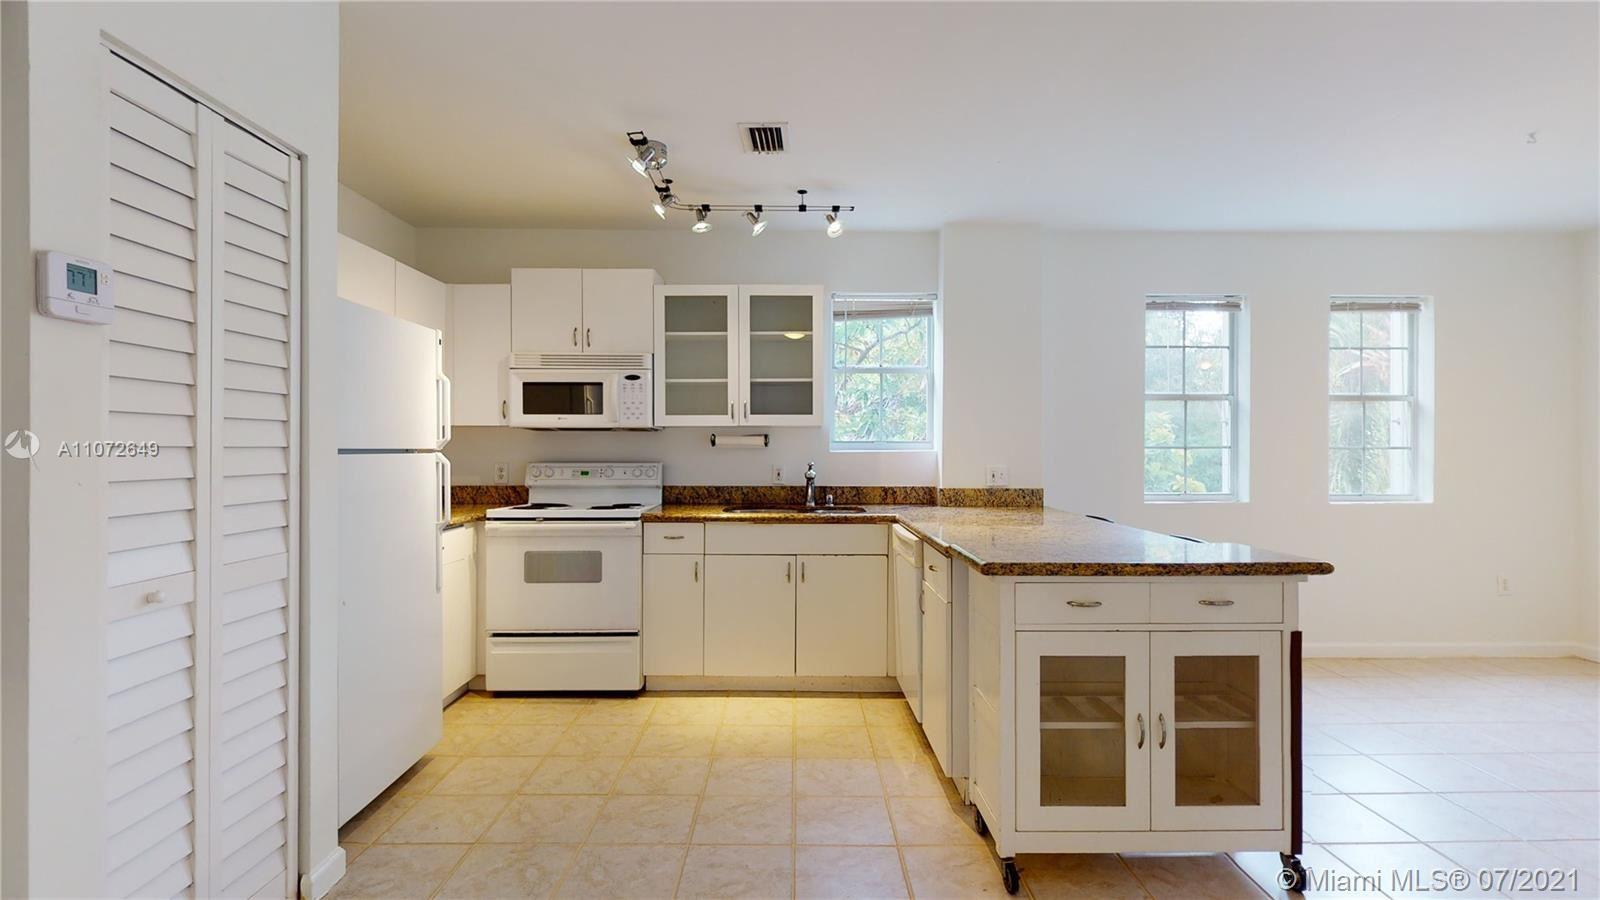 2850 Coconut Ave #12, Coconut Grove, FL 33133 - #: A11072649